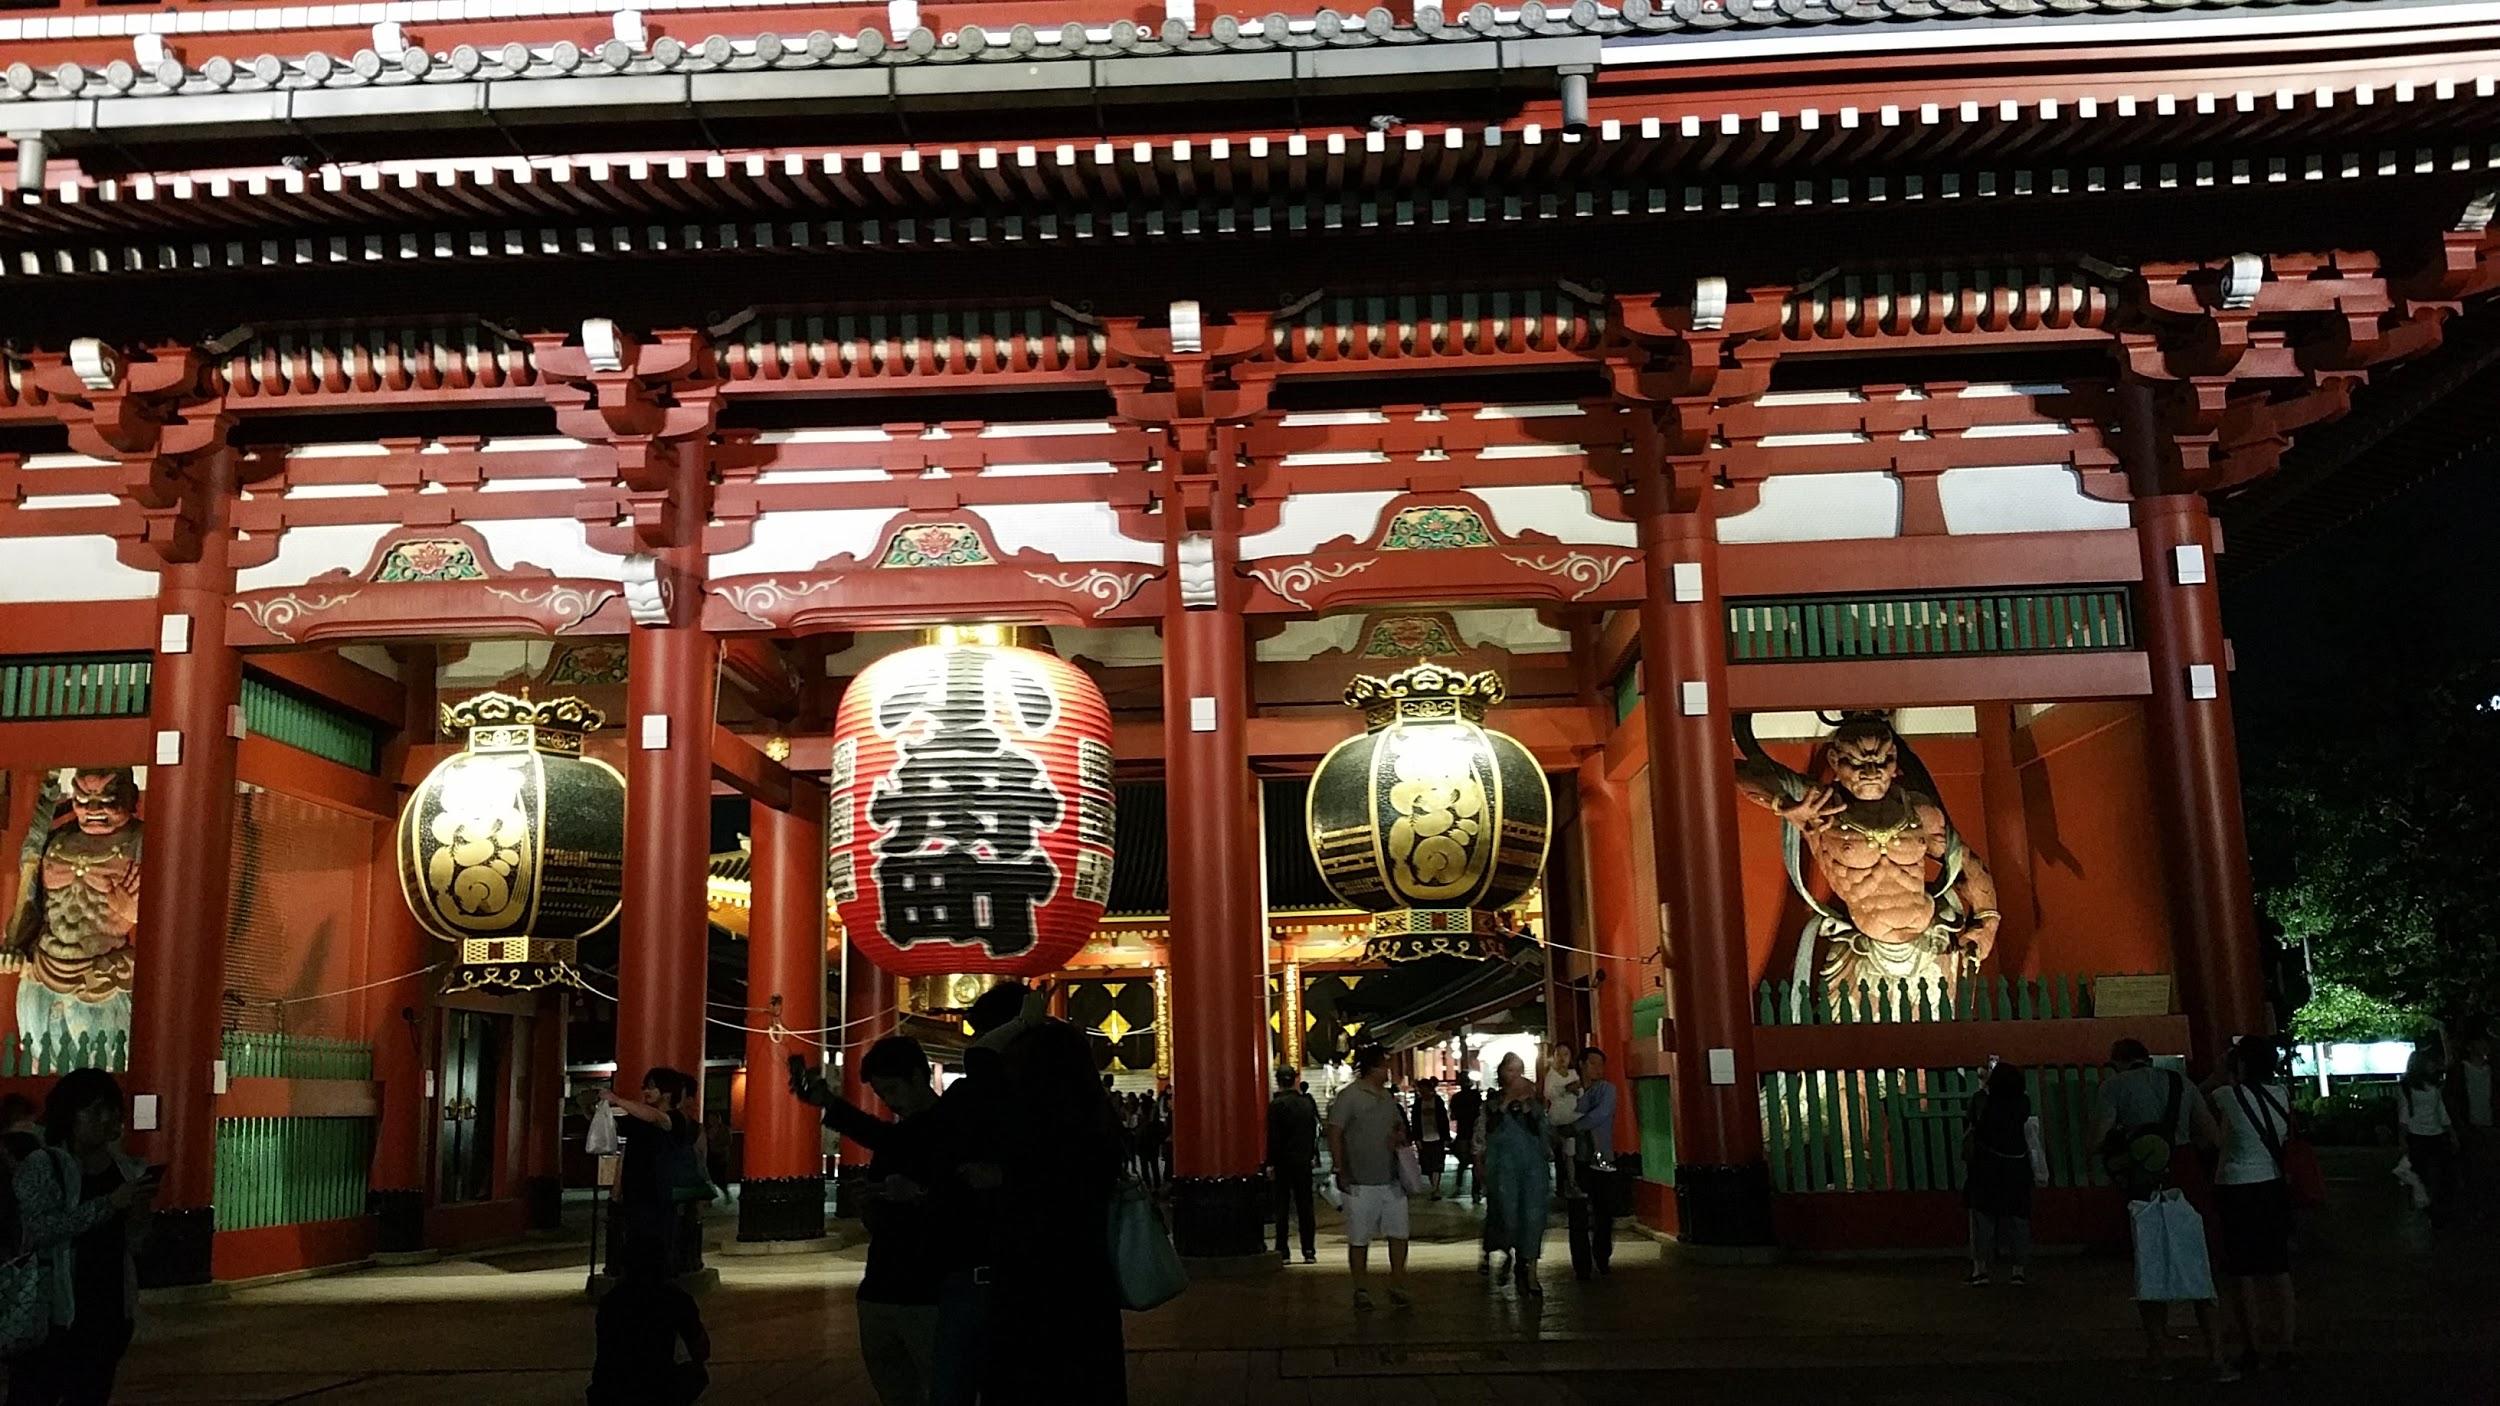 Japanese Buddhist temple - Sensō-ji